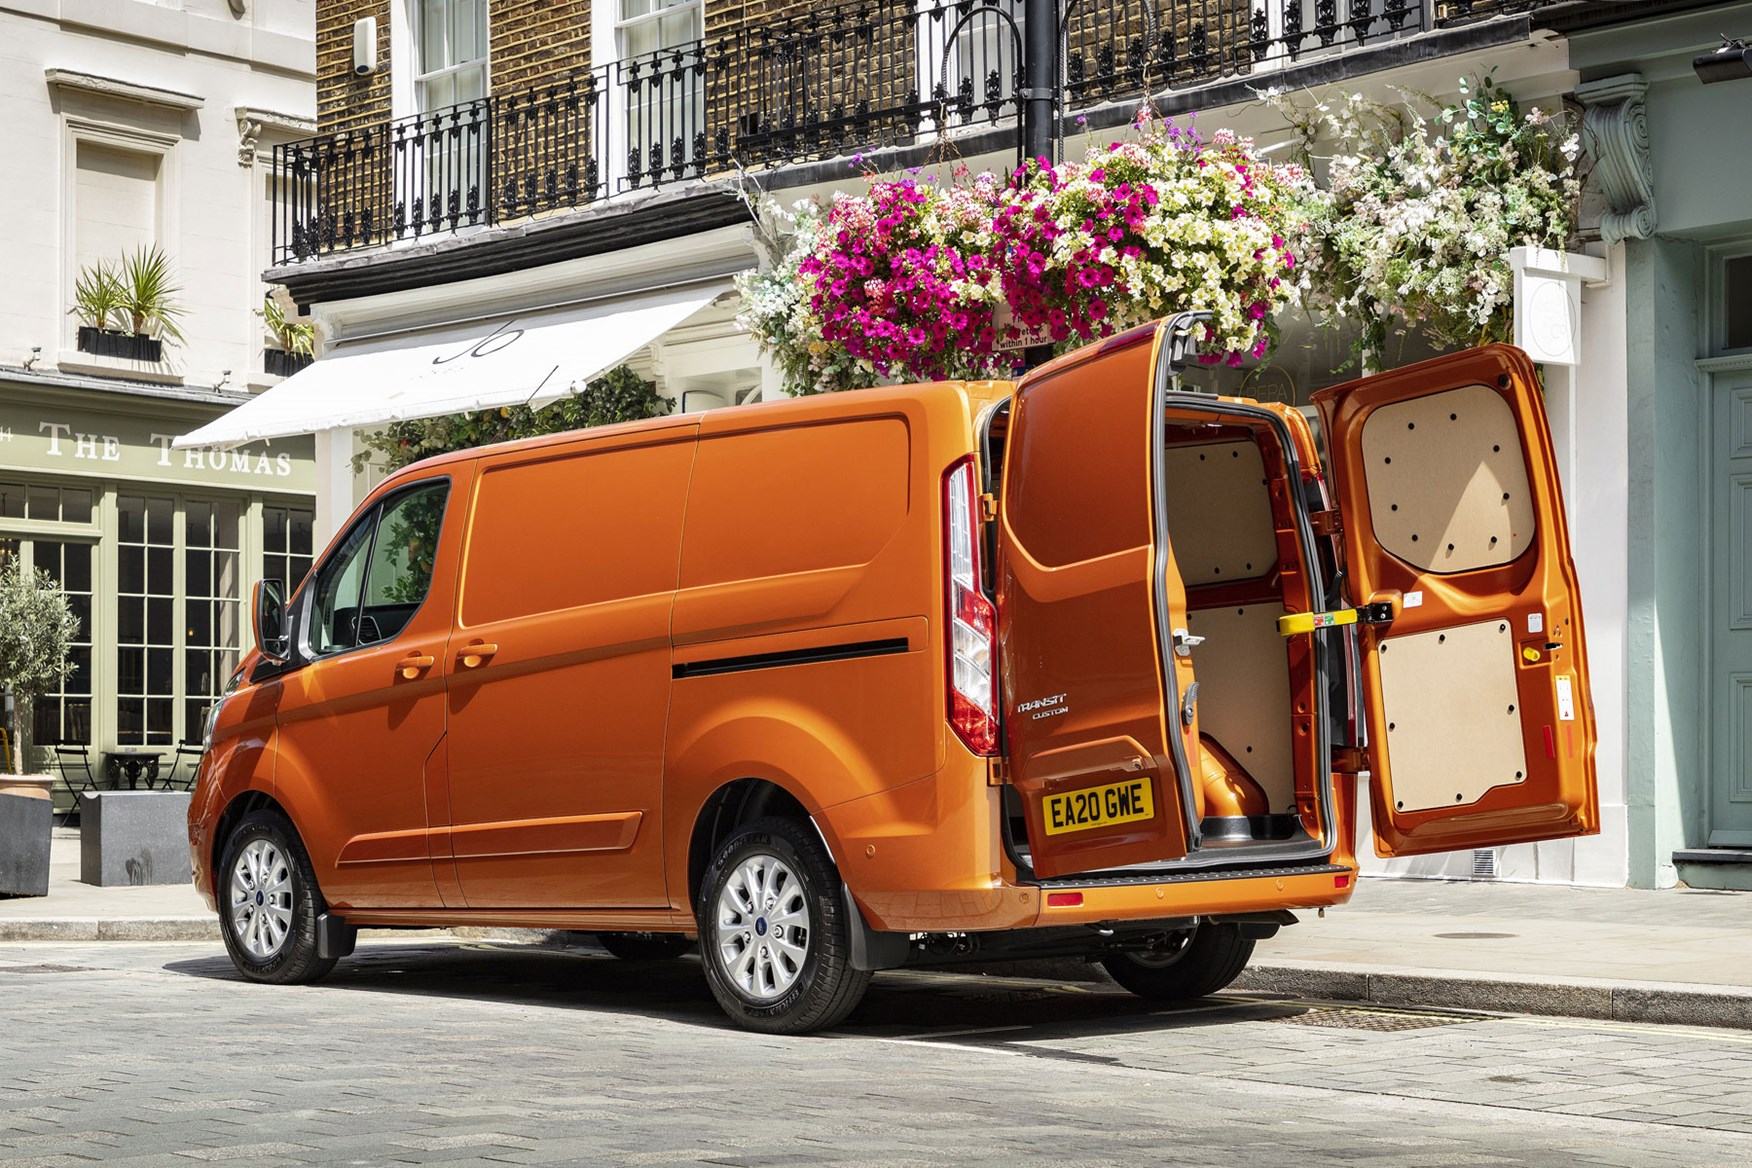 Ford Transit Custom Plug-In Hybrid, 2020, exterior dimensions, rear view, doors open, orange